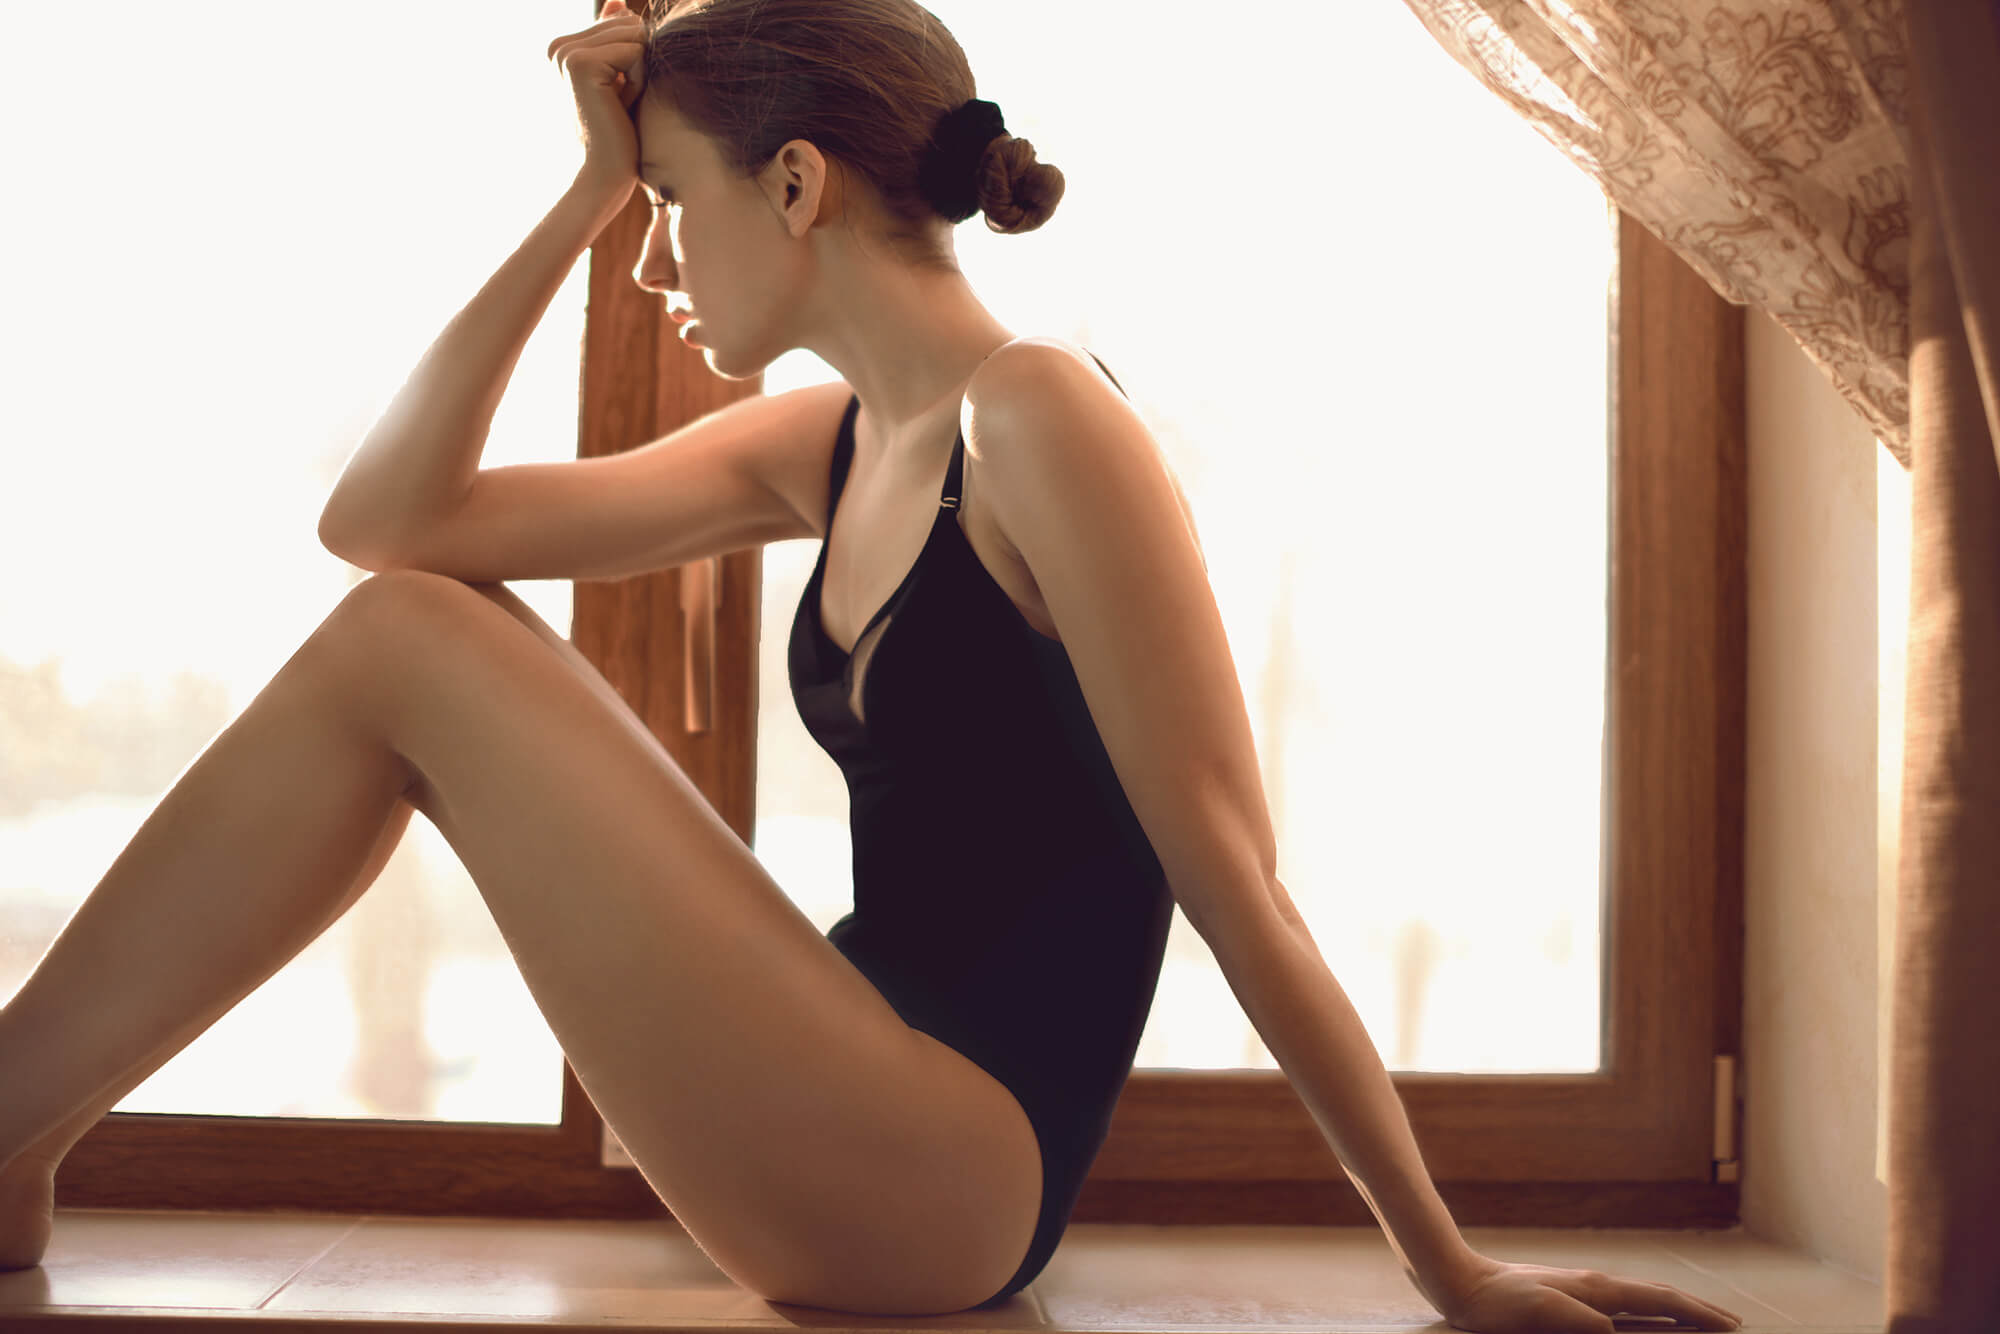 163265-o-que-e-anorexia-e-como-combater-essa-vila-da-saude